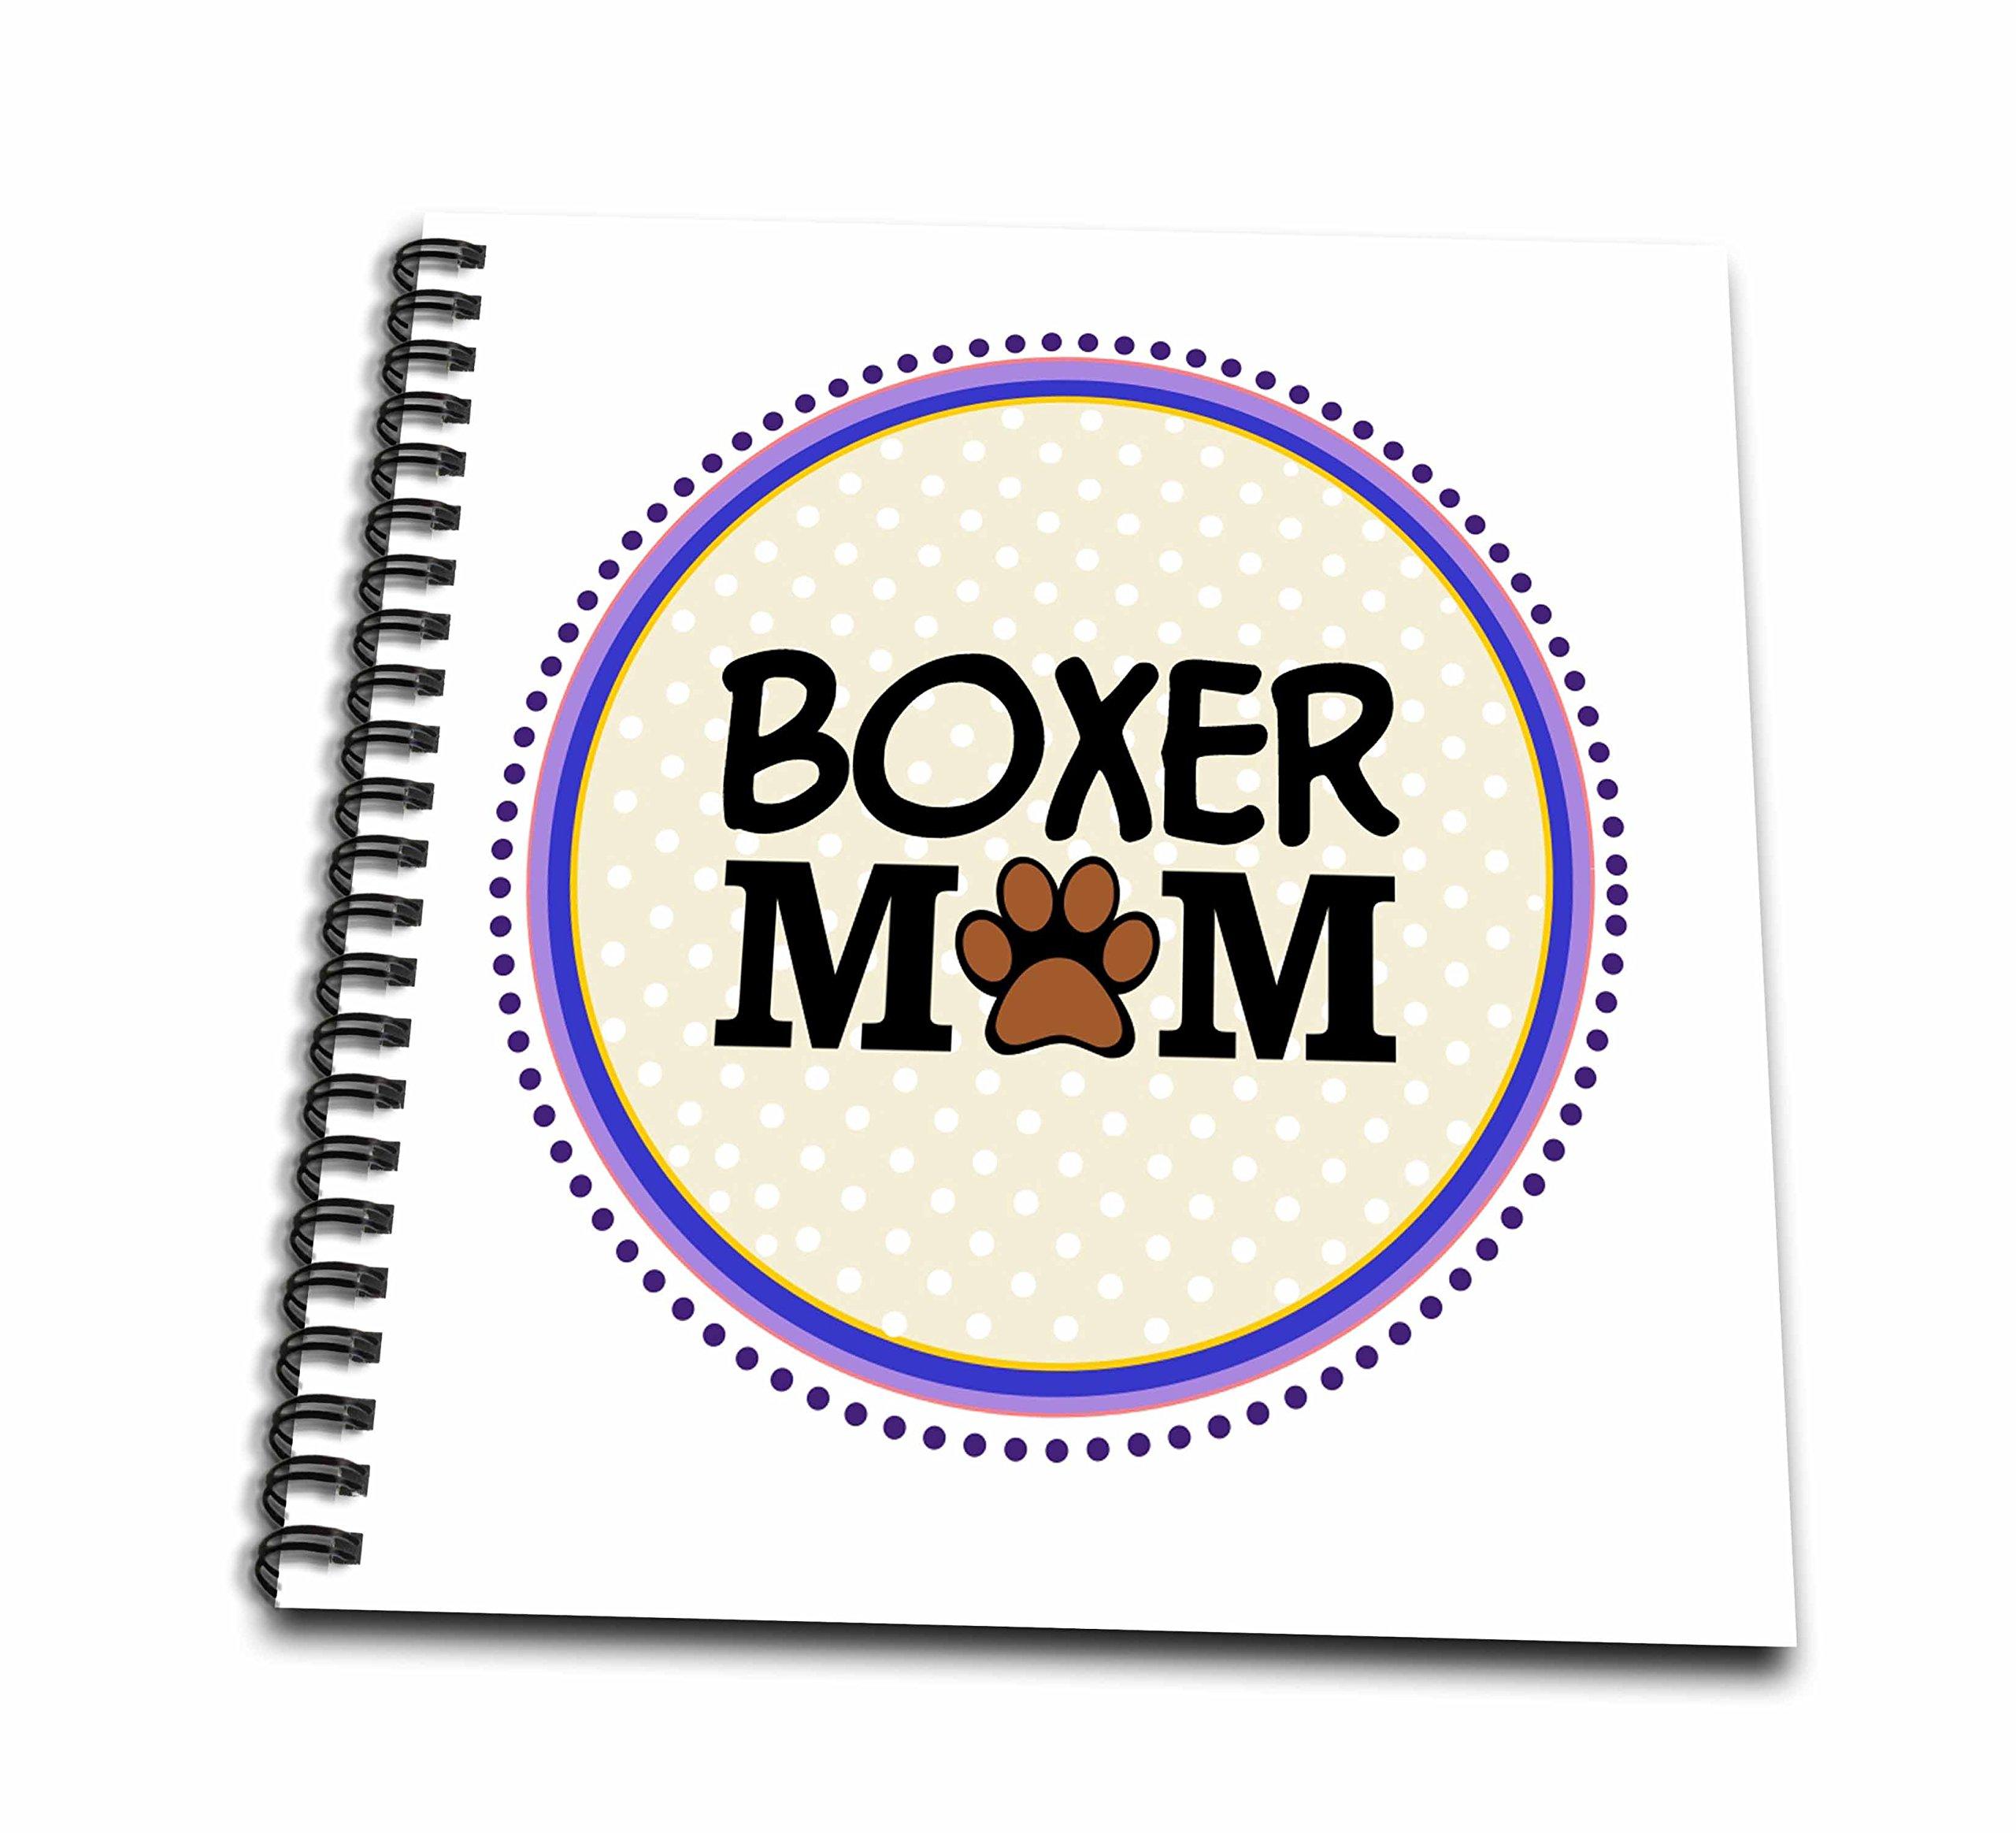 inspirationz Store PET 设计–平角 DOG Mom–doggie MAMA BY breed–爪印母婴 LOVE–Doggy LOVER–Proud 宠物主人圆圈–绘本